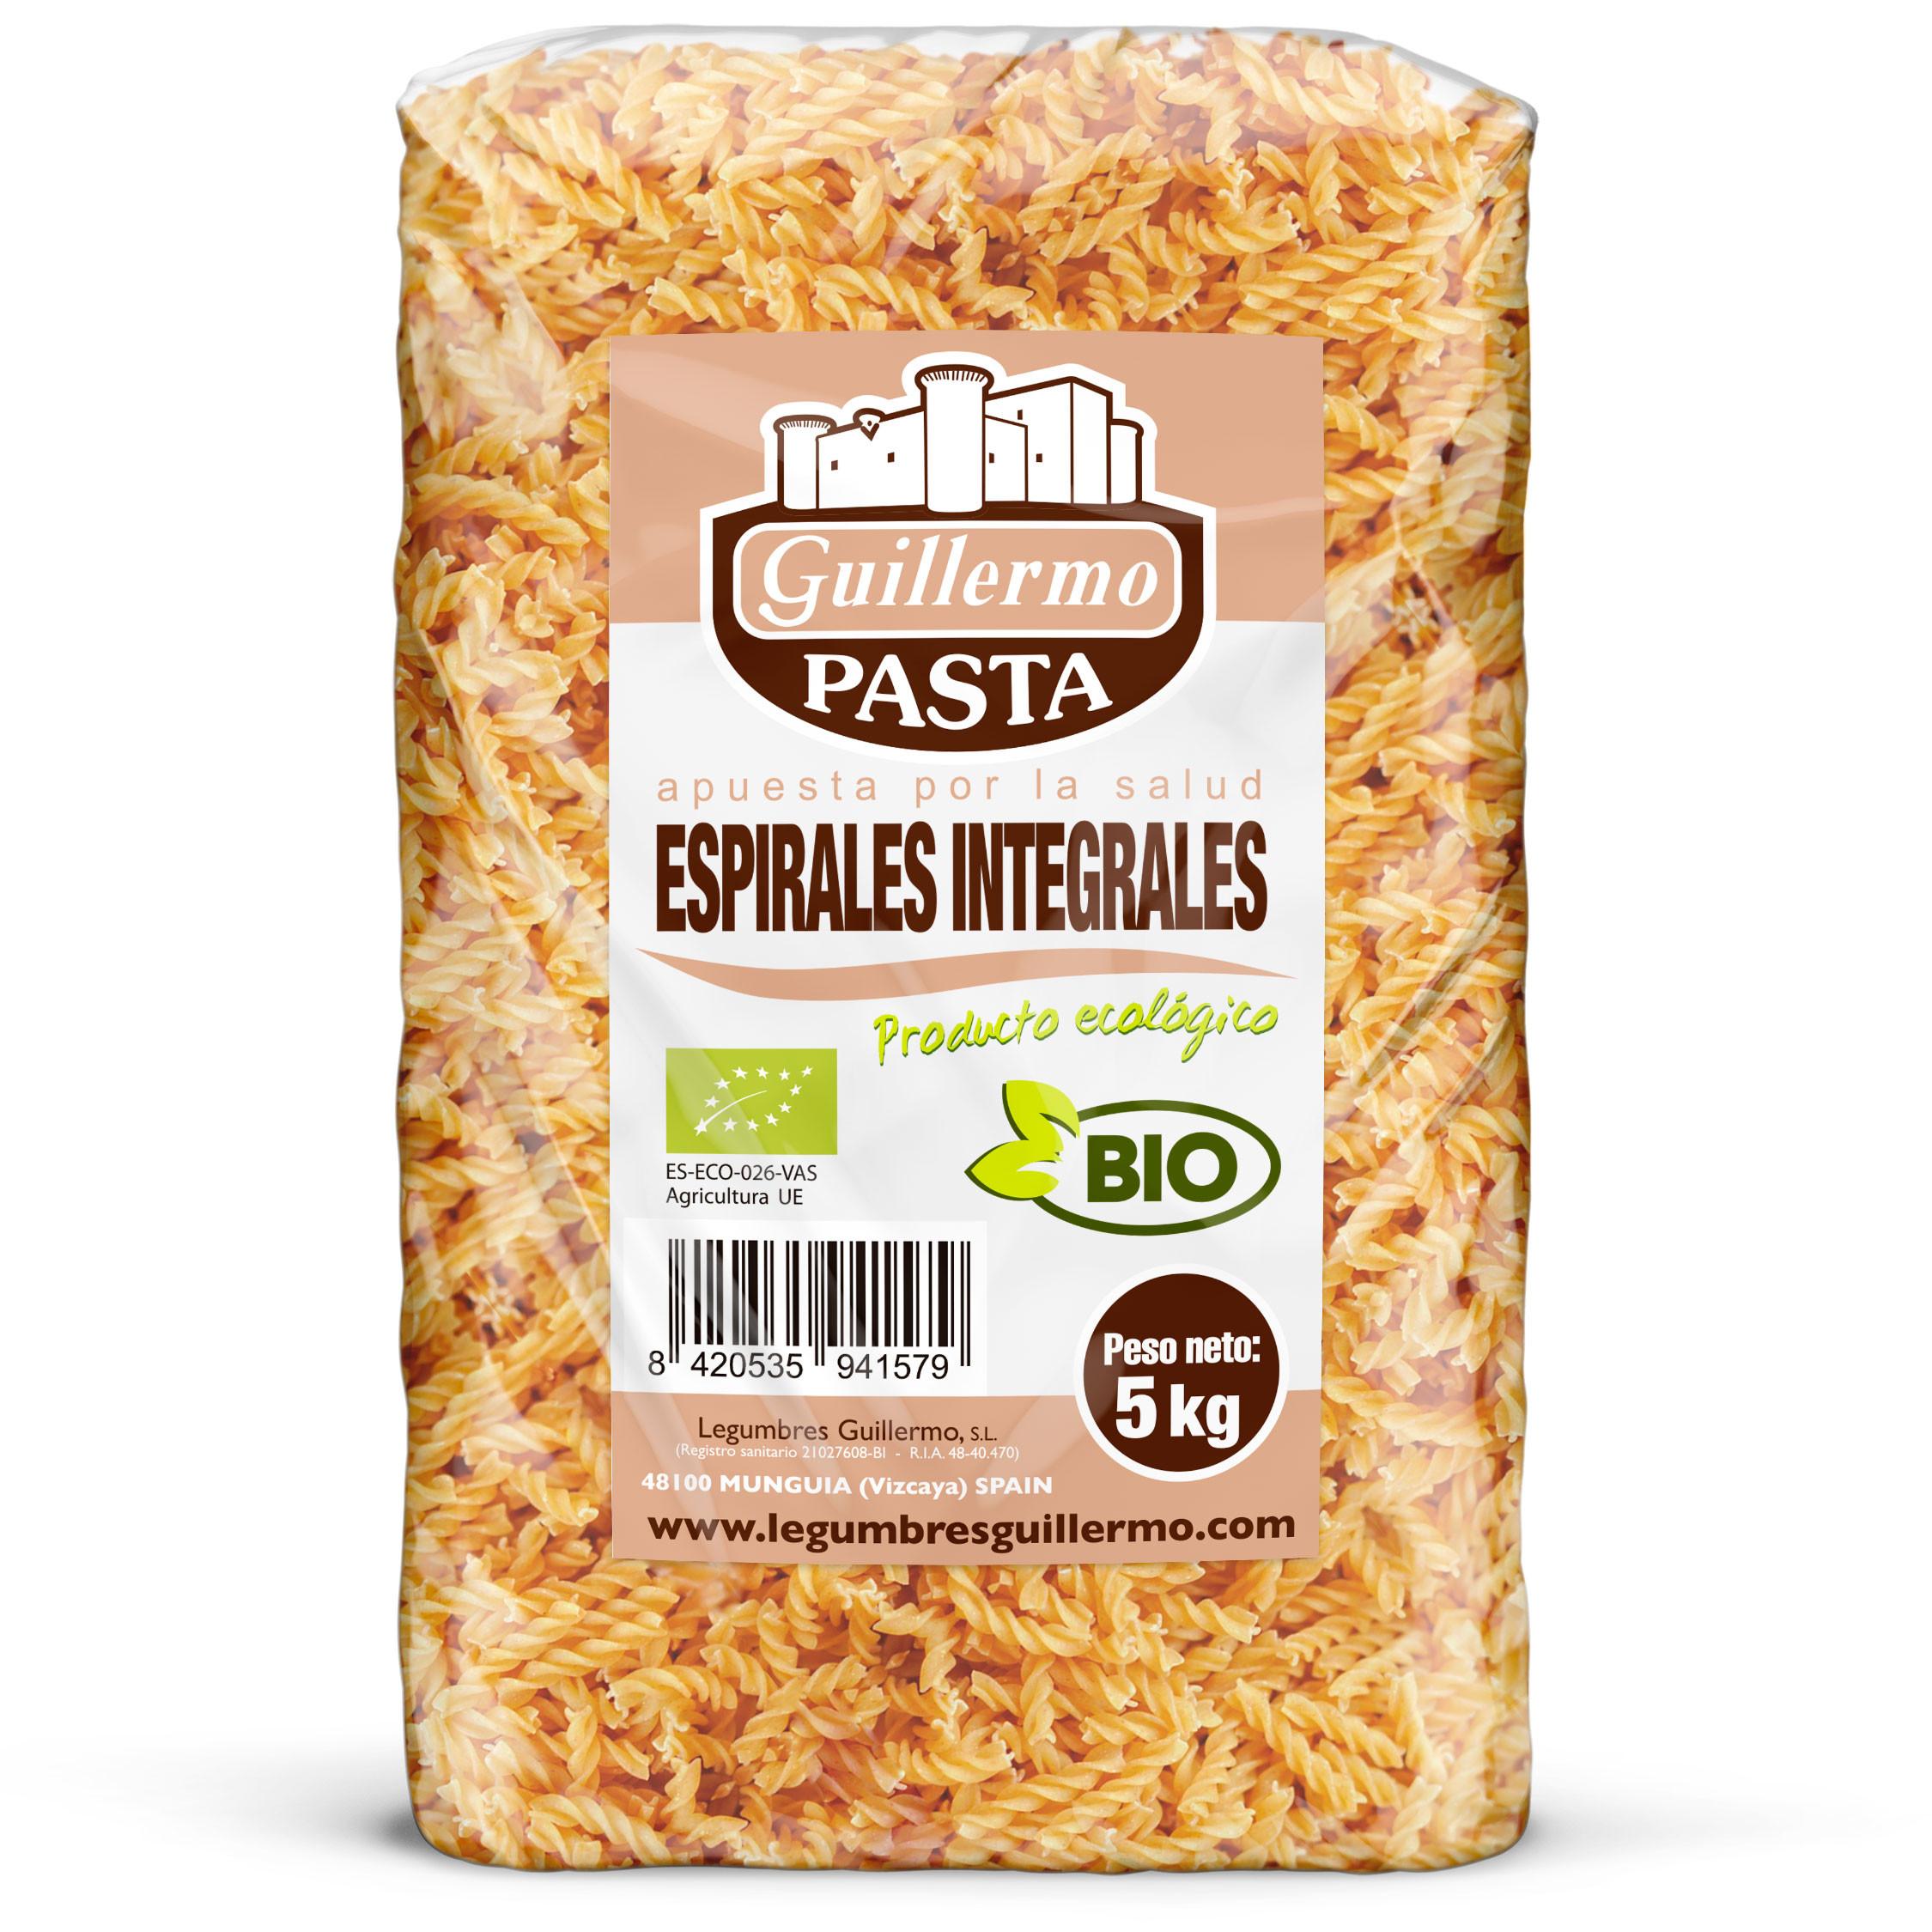 Guillermo Horeca Espirales Integrales Ecológicas BIO Granel 5kg